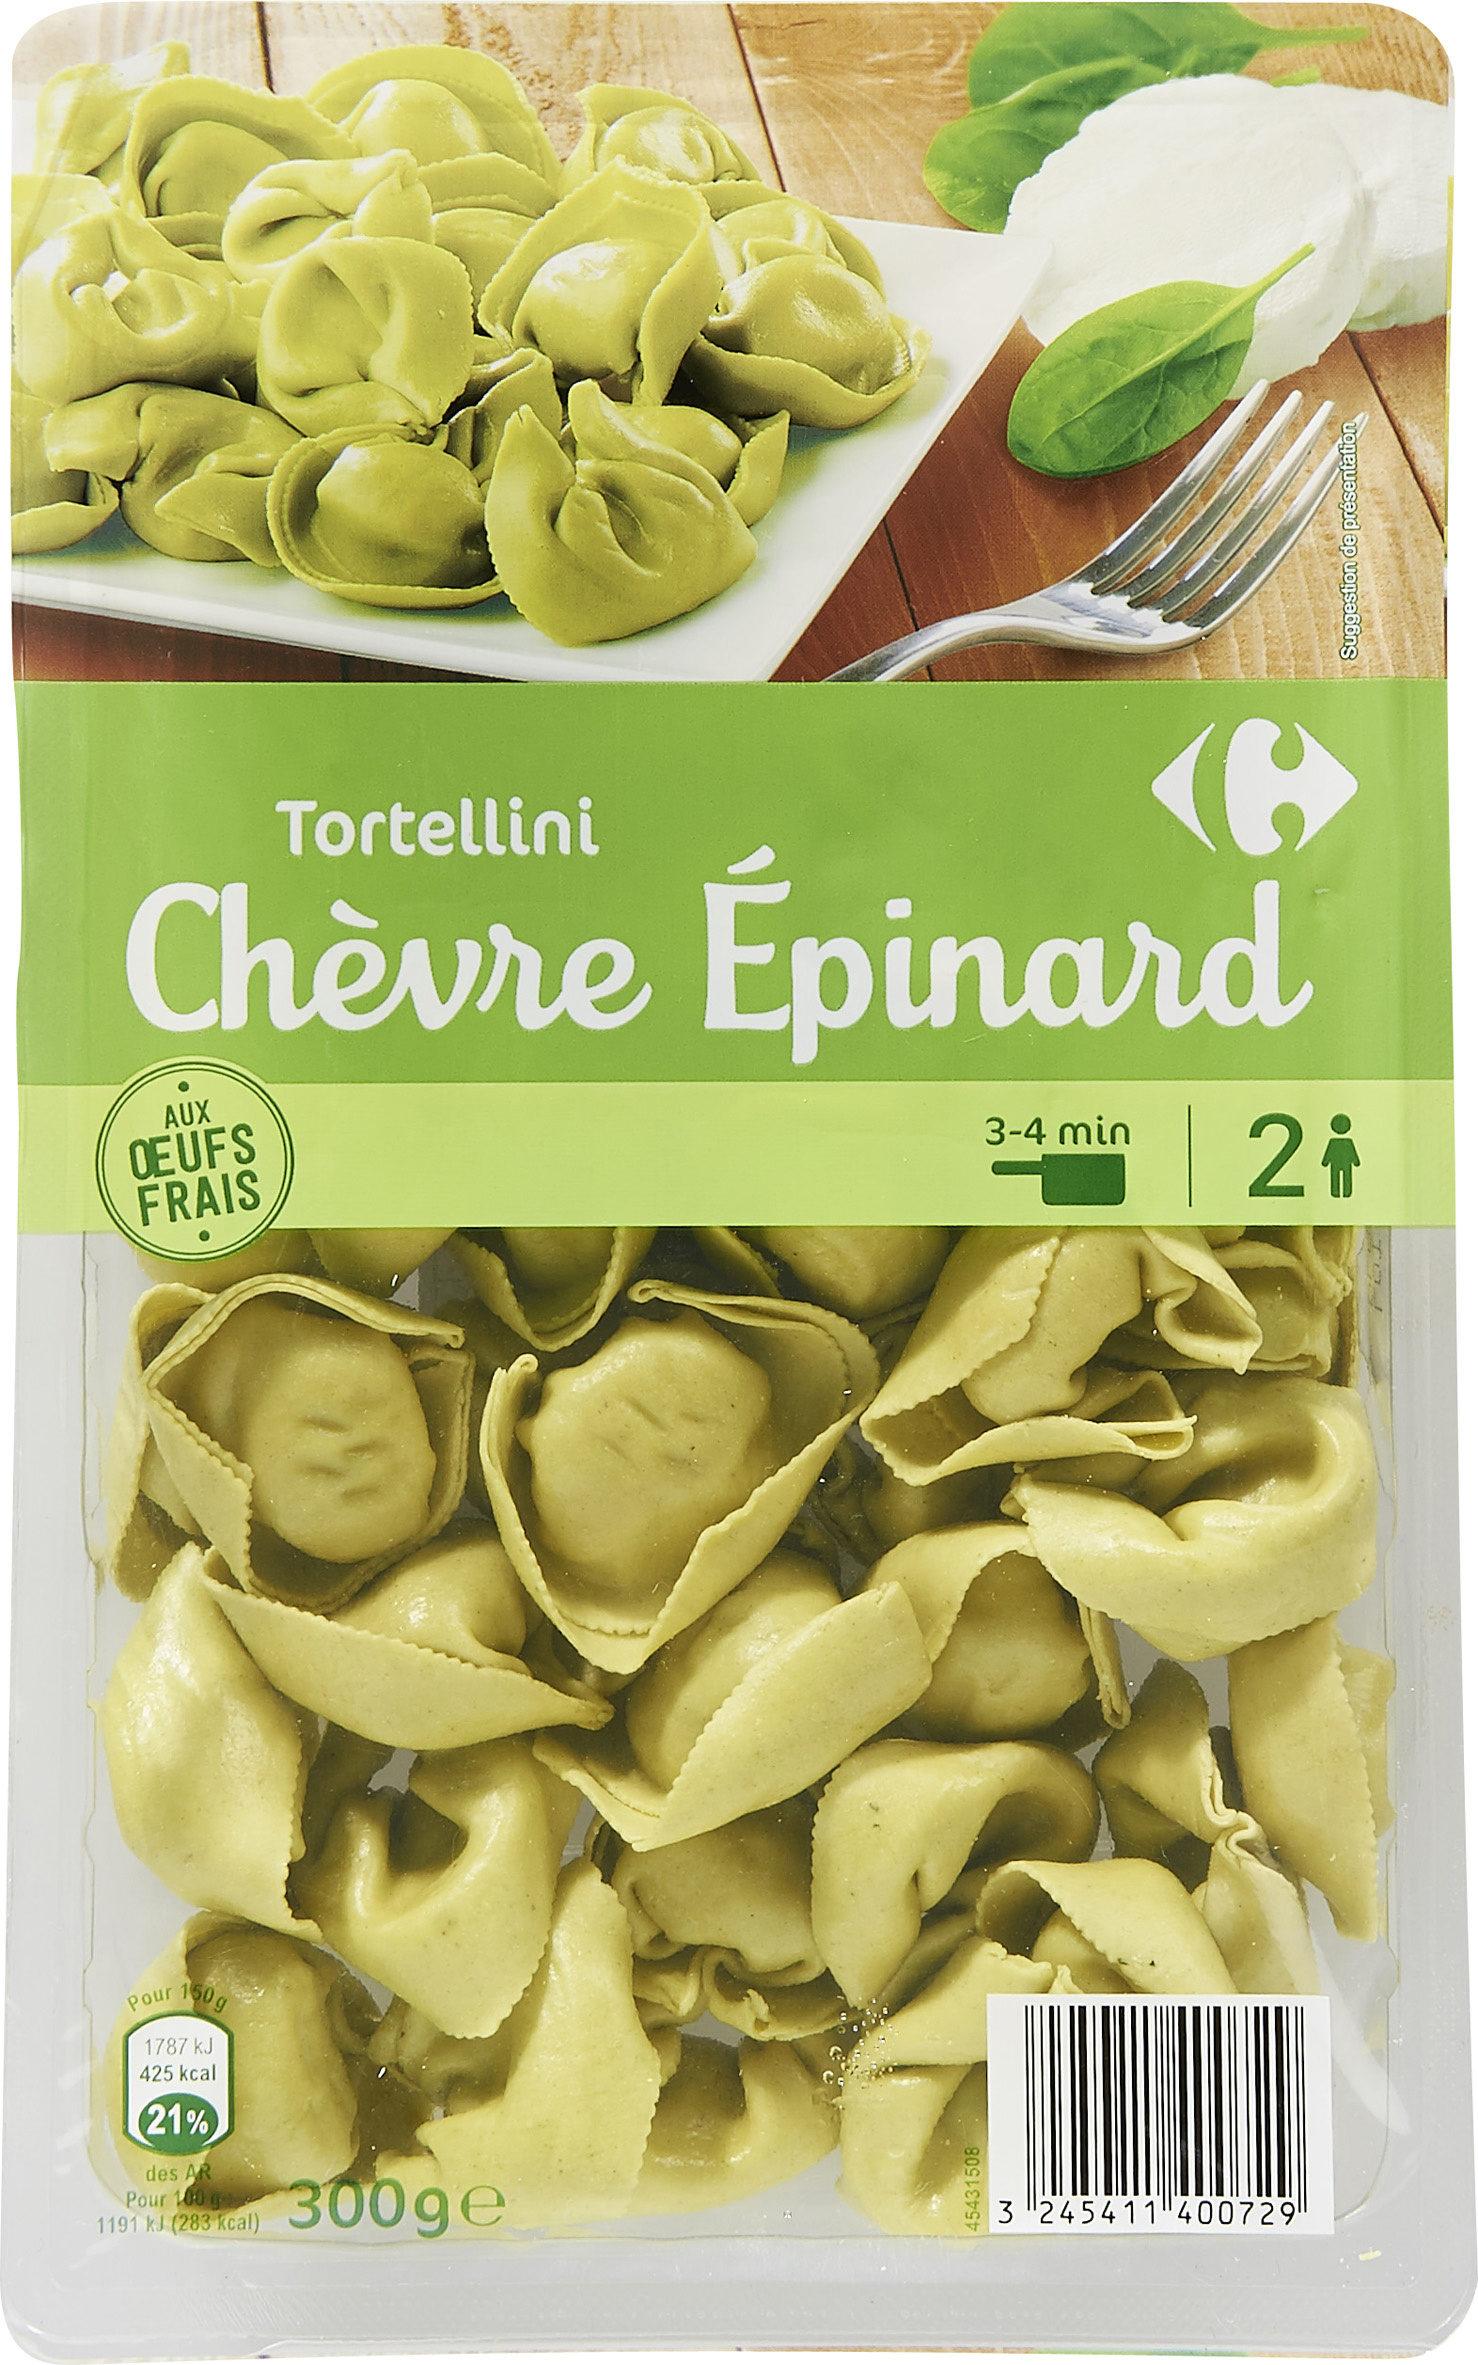 Tortellini Chèvre Épinard - Product